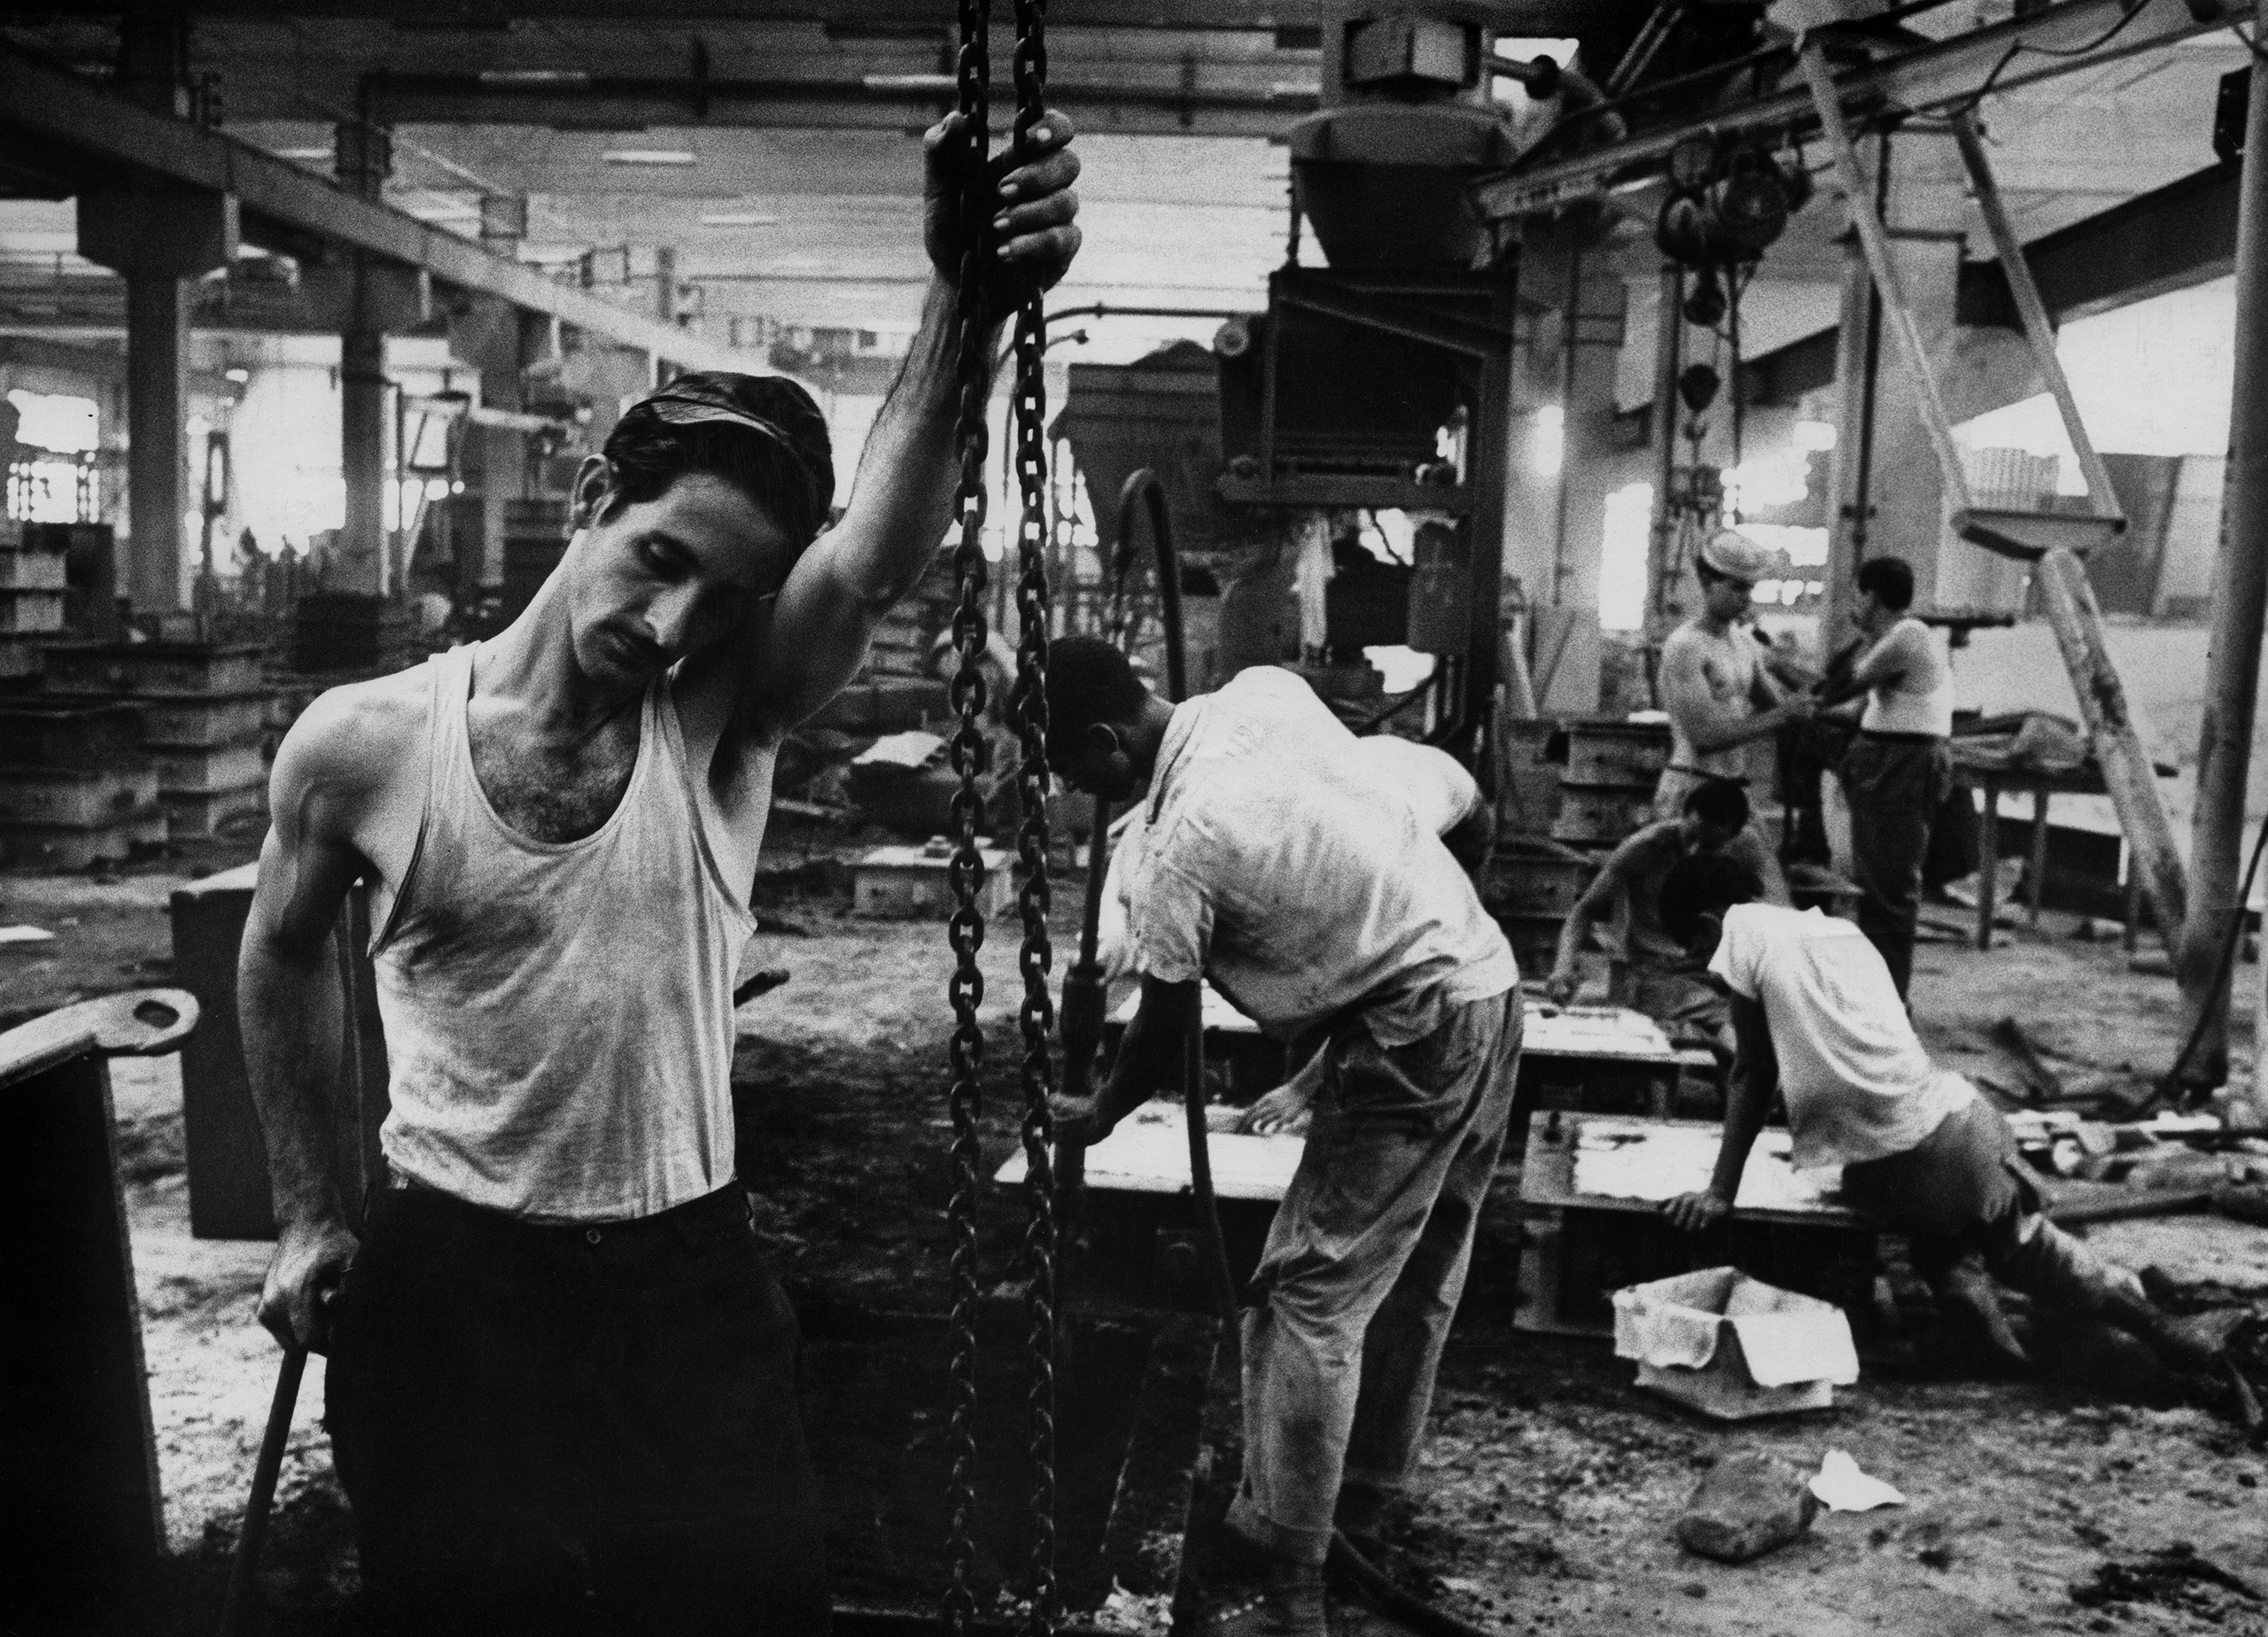 A factory in Cuba, 1963.